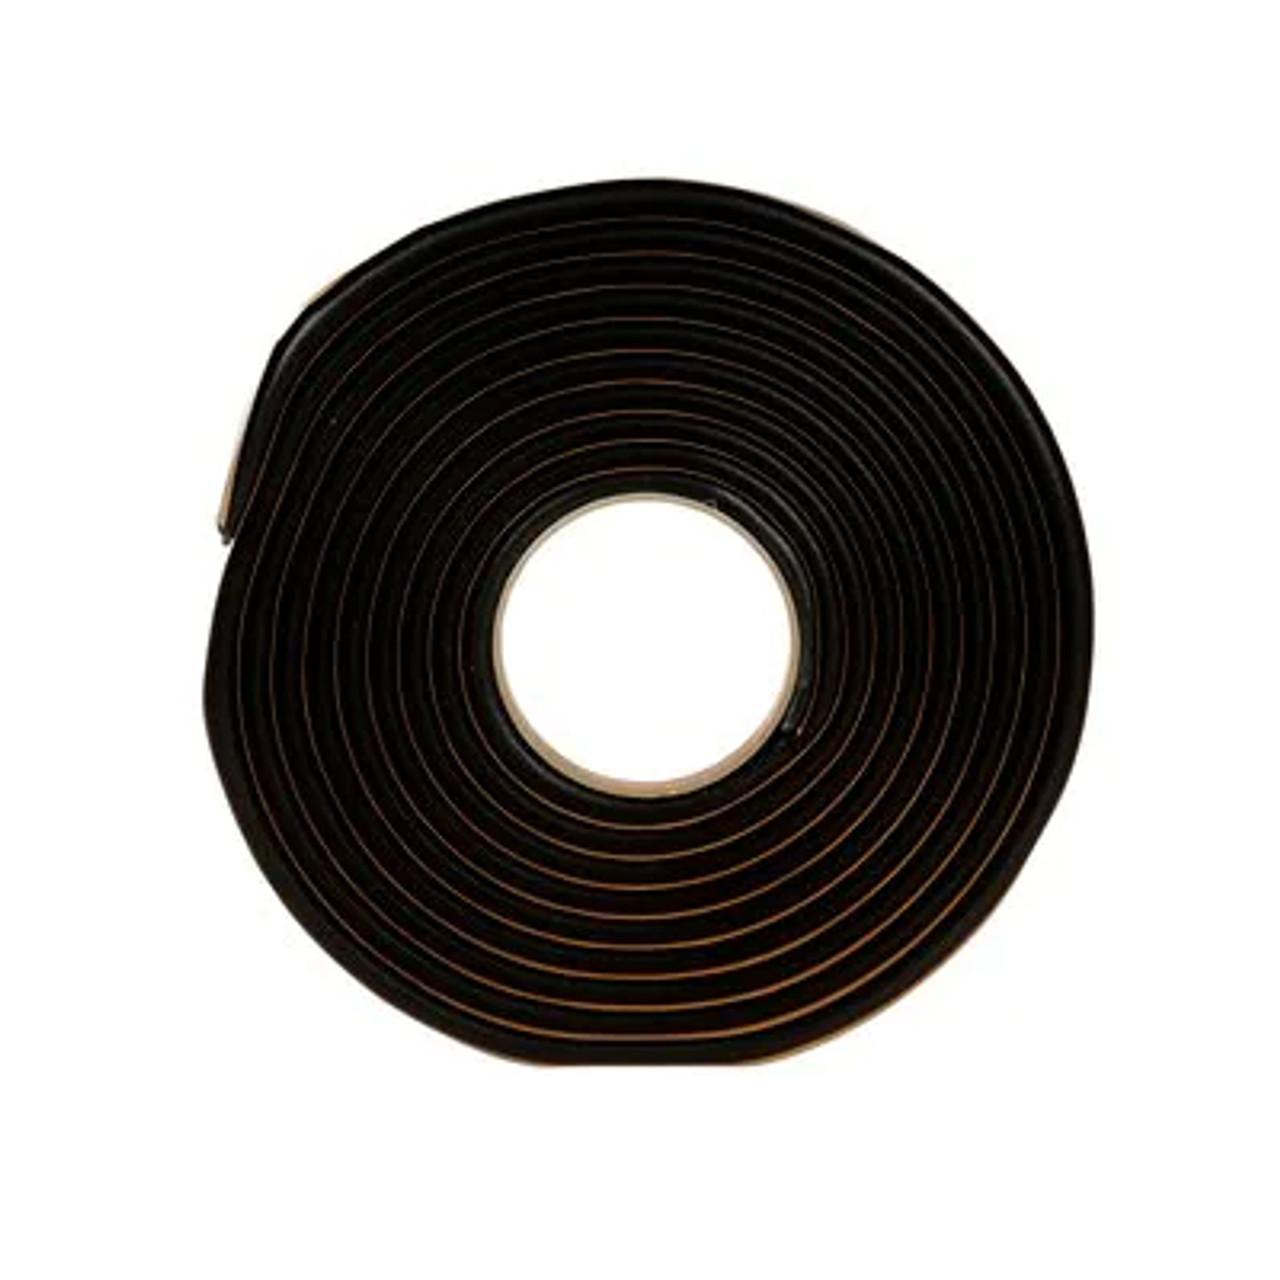 3M™ Windo-Weld™ Round Ribbon Sealer, 08612, 3/8 in x 15 ft Kit